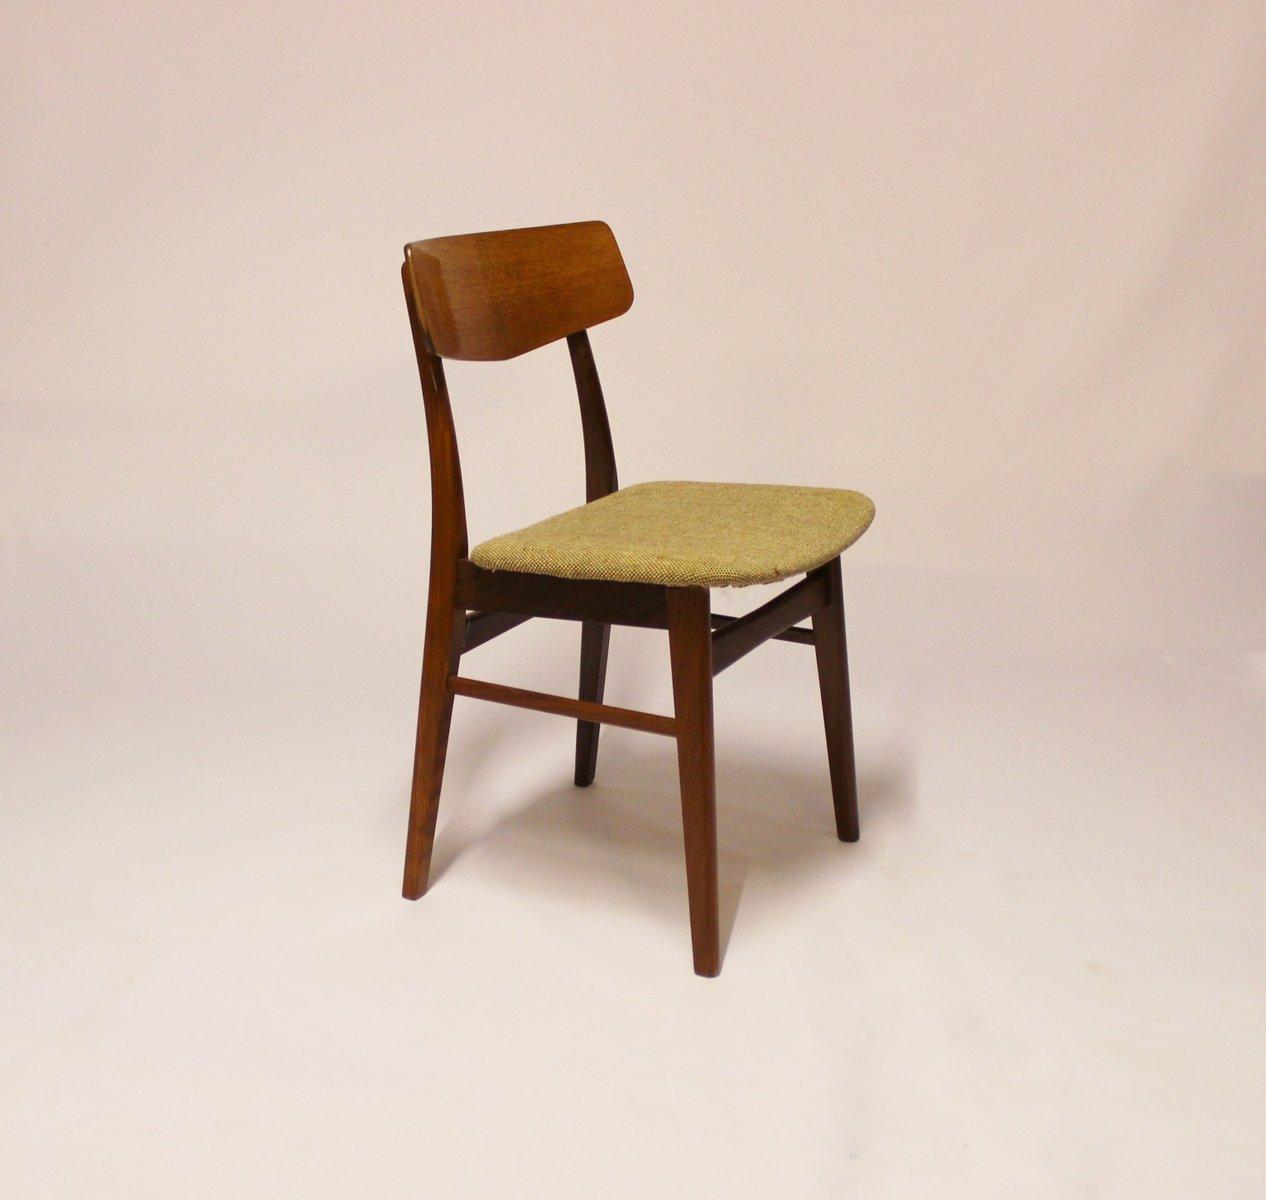 d nischer teak stuhl 1960er bei pamono kaufen. Black Bedroom Furniture Sets. Home Design Ideas